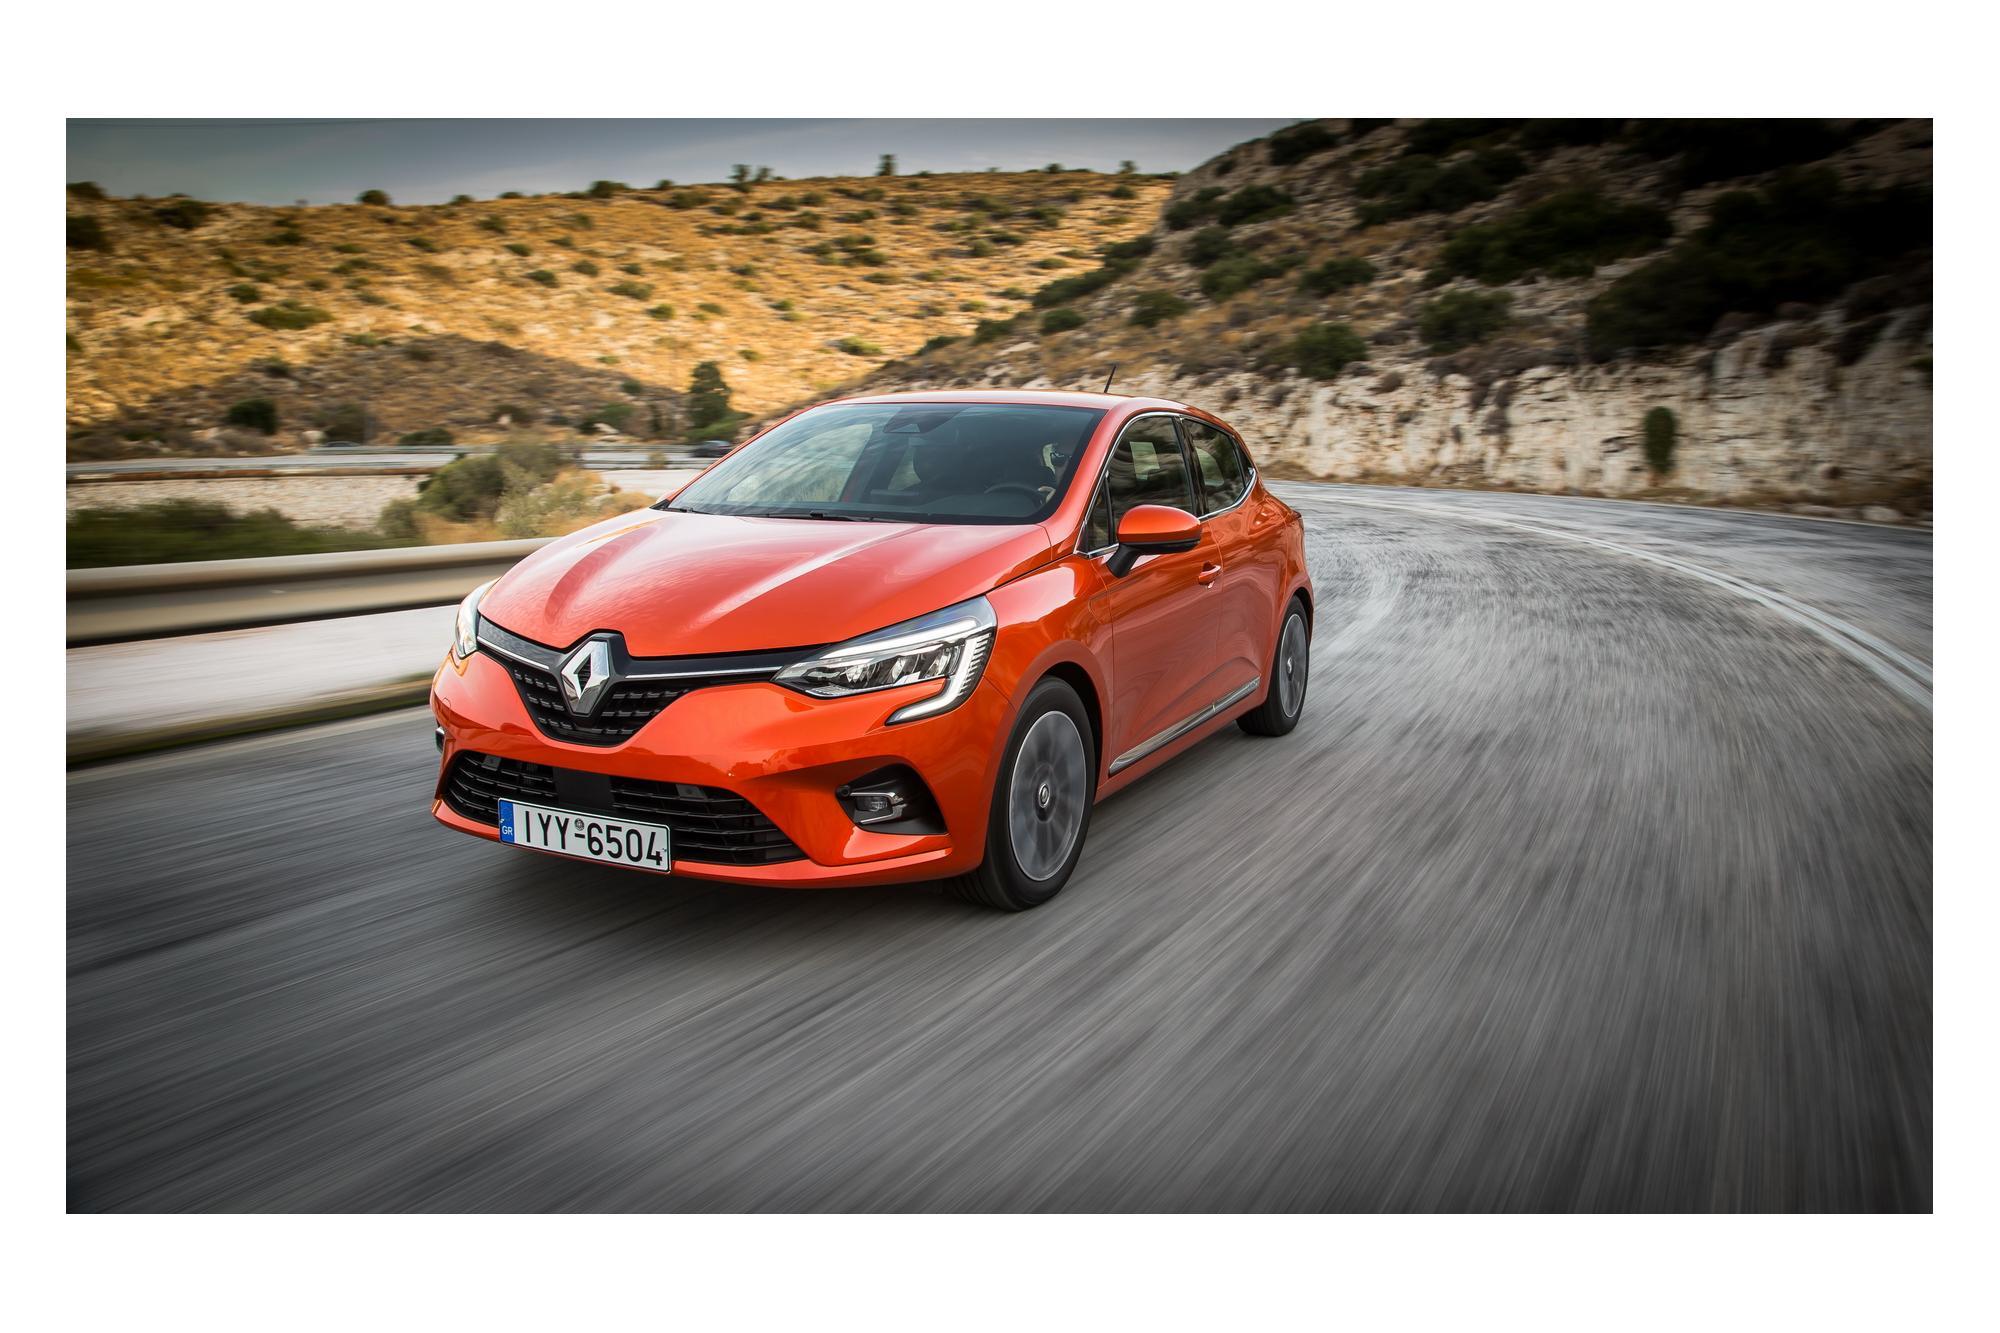 Tο νέο Renault Clio με double bonus